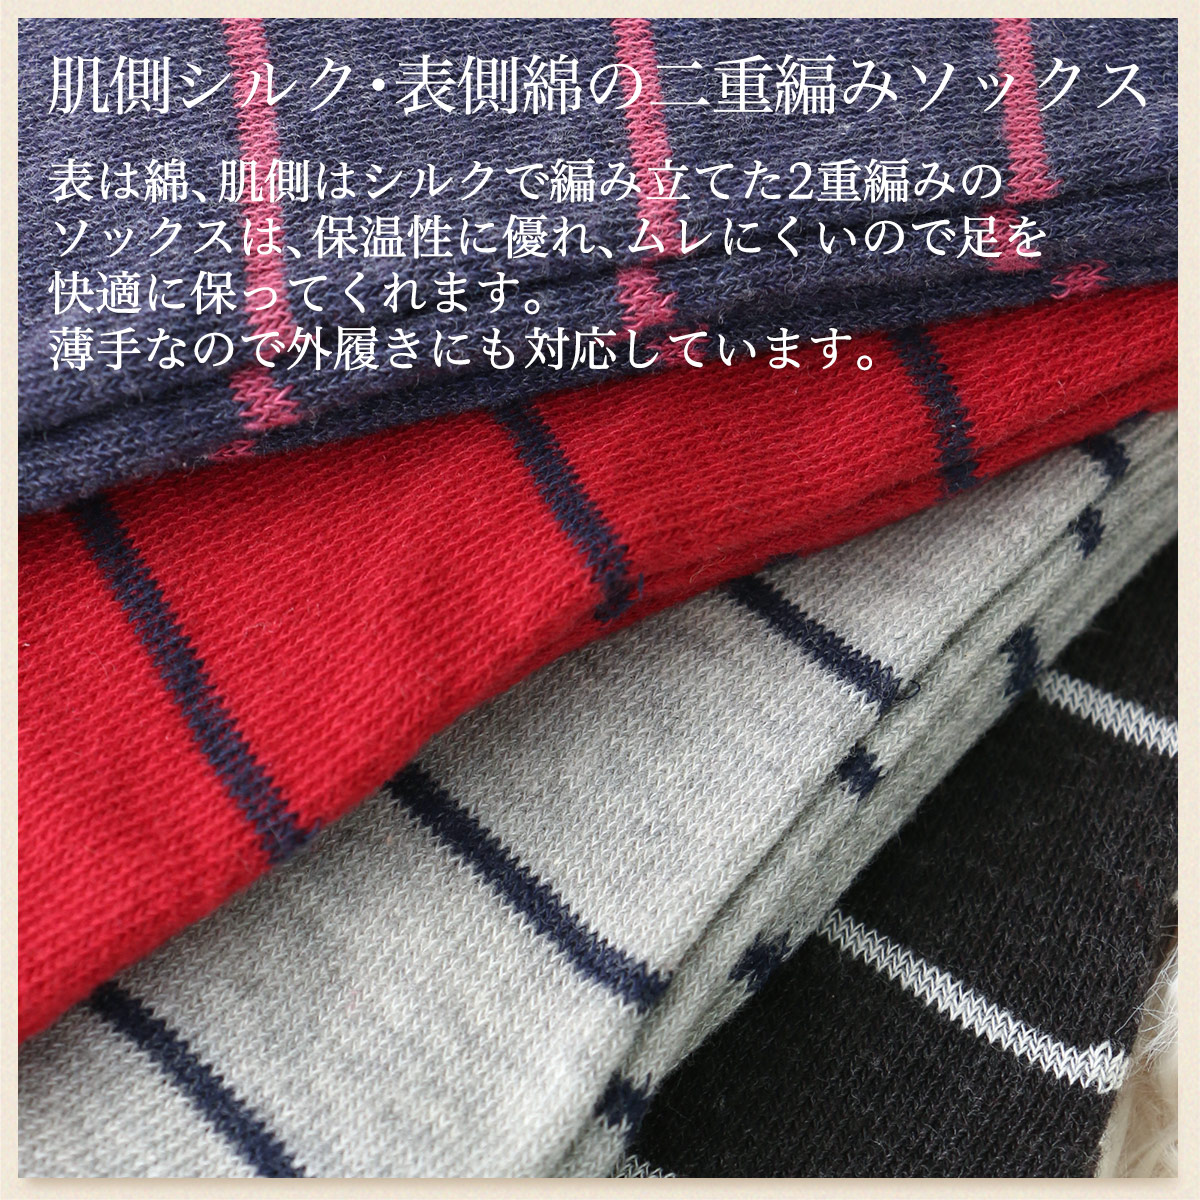 NAIGAI COMFORT ナイガイ コンフォート 日本製 シルク 絹混 ボーダー 肌側シルク(絹)・外側コットン(綿) 外履きOKの柔らか薄手の2重編みソックス レディース 女性用 靴下 3022-322【ゆうパケット・4点まで】